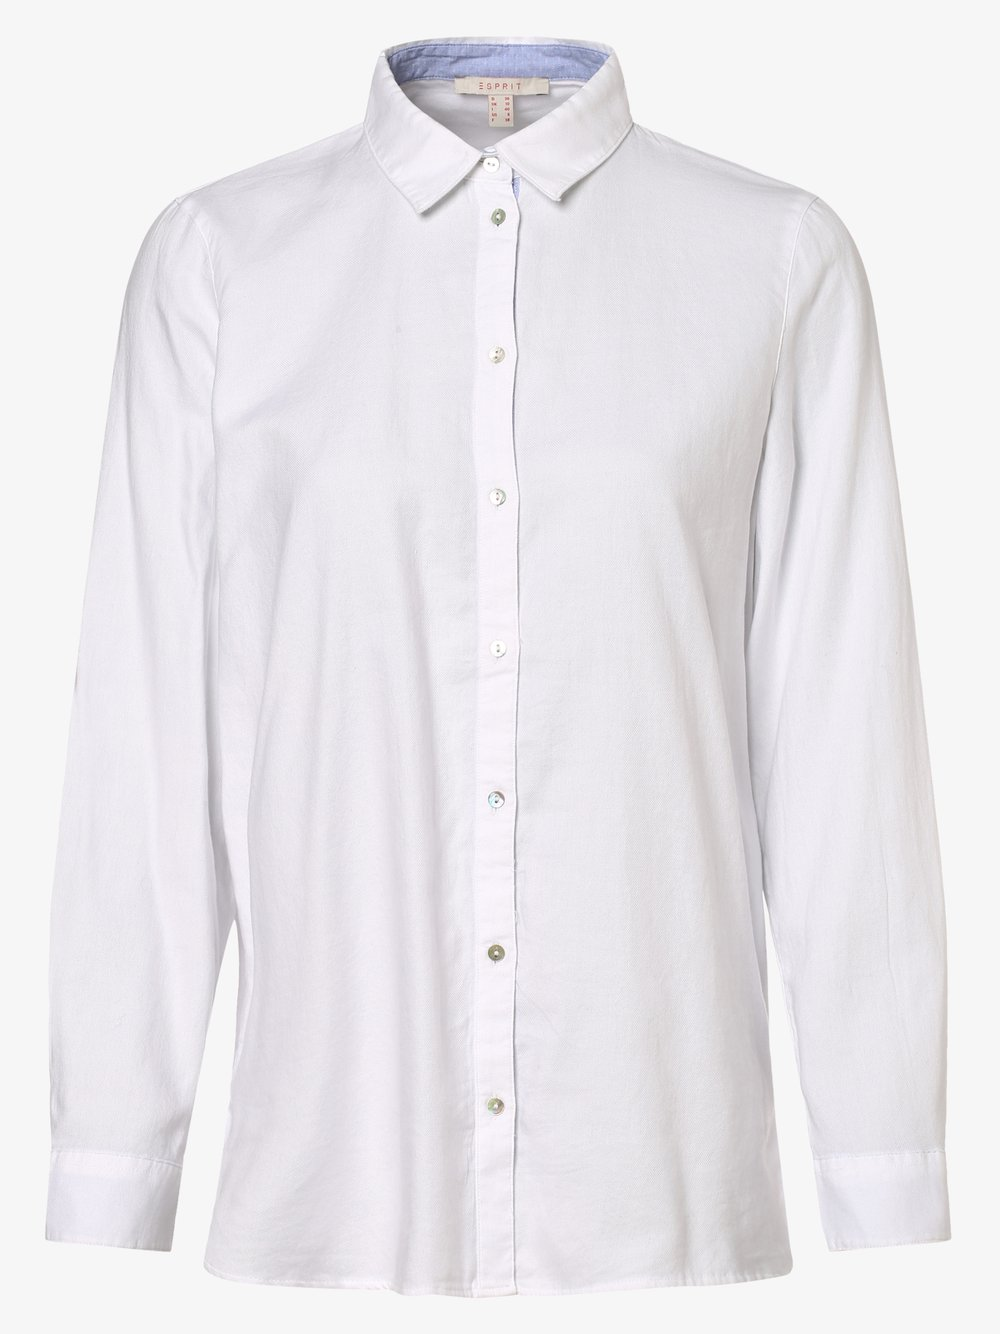 Esprit Casual – Bluzka damska, biały Van Graaf 479730-0001-00360